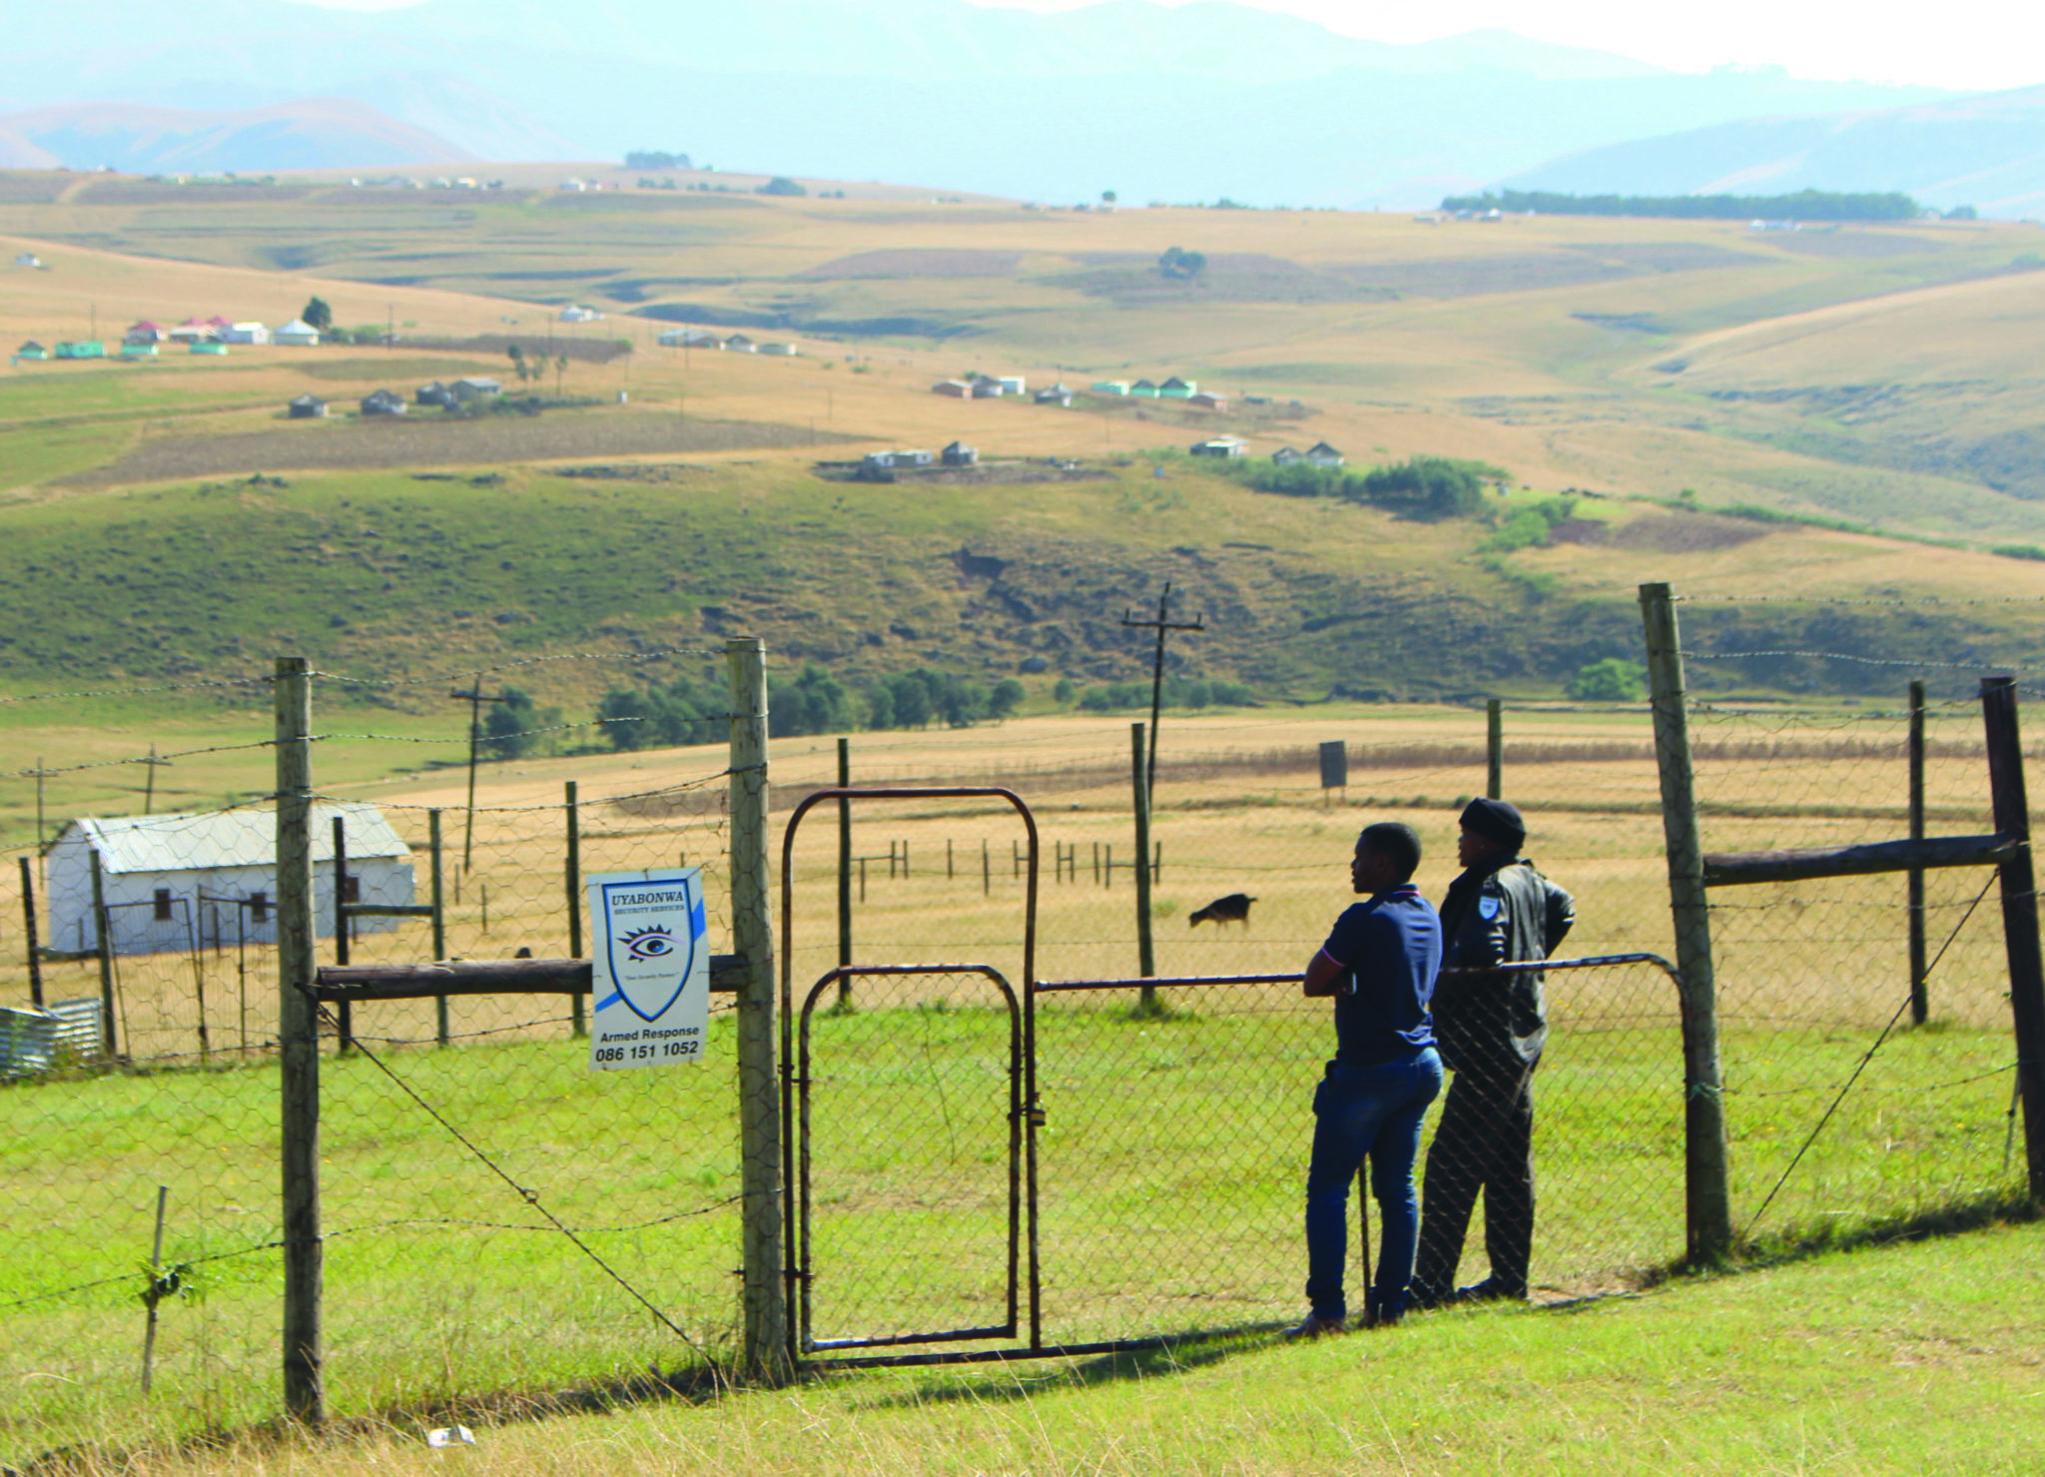 CASE STUDY: Mbizana, a rural South African municipality